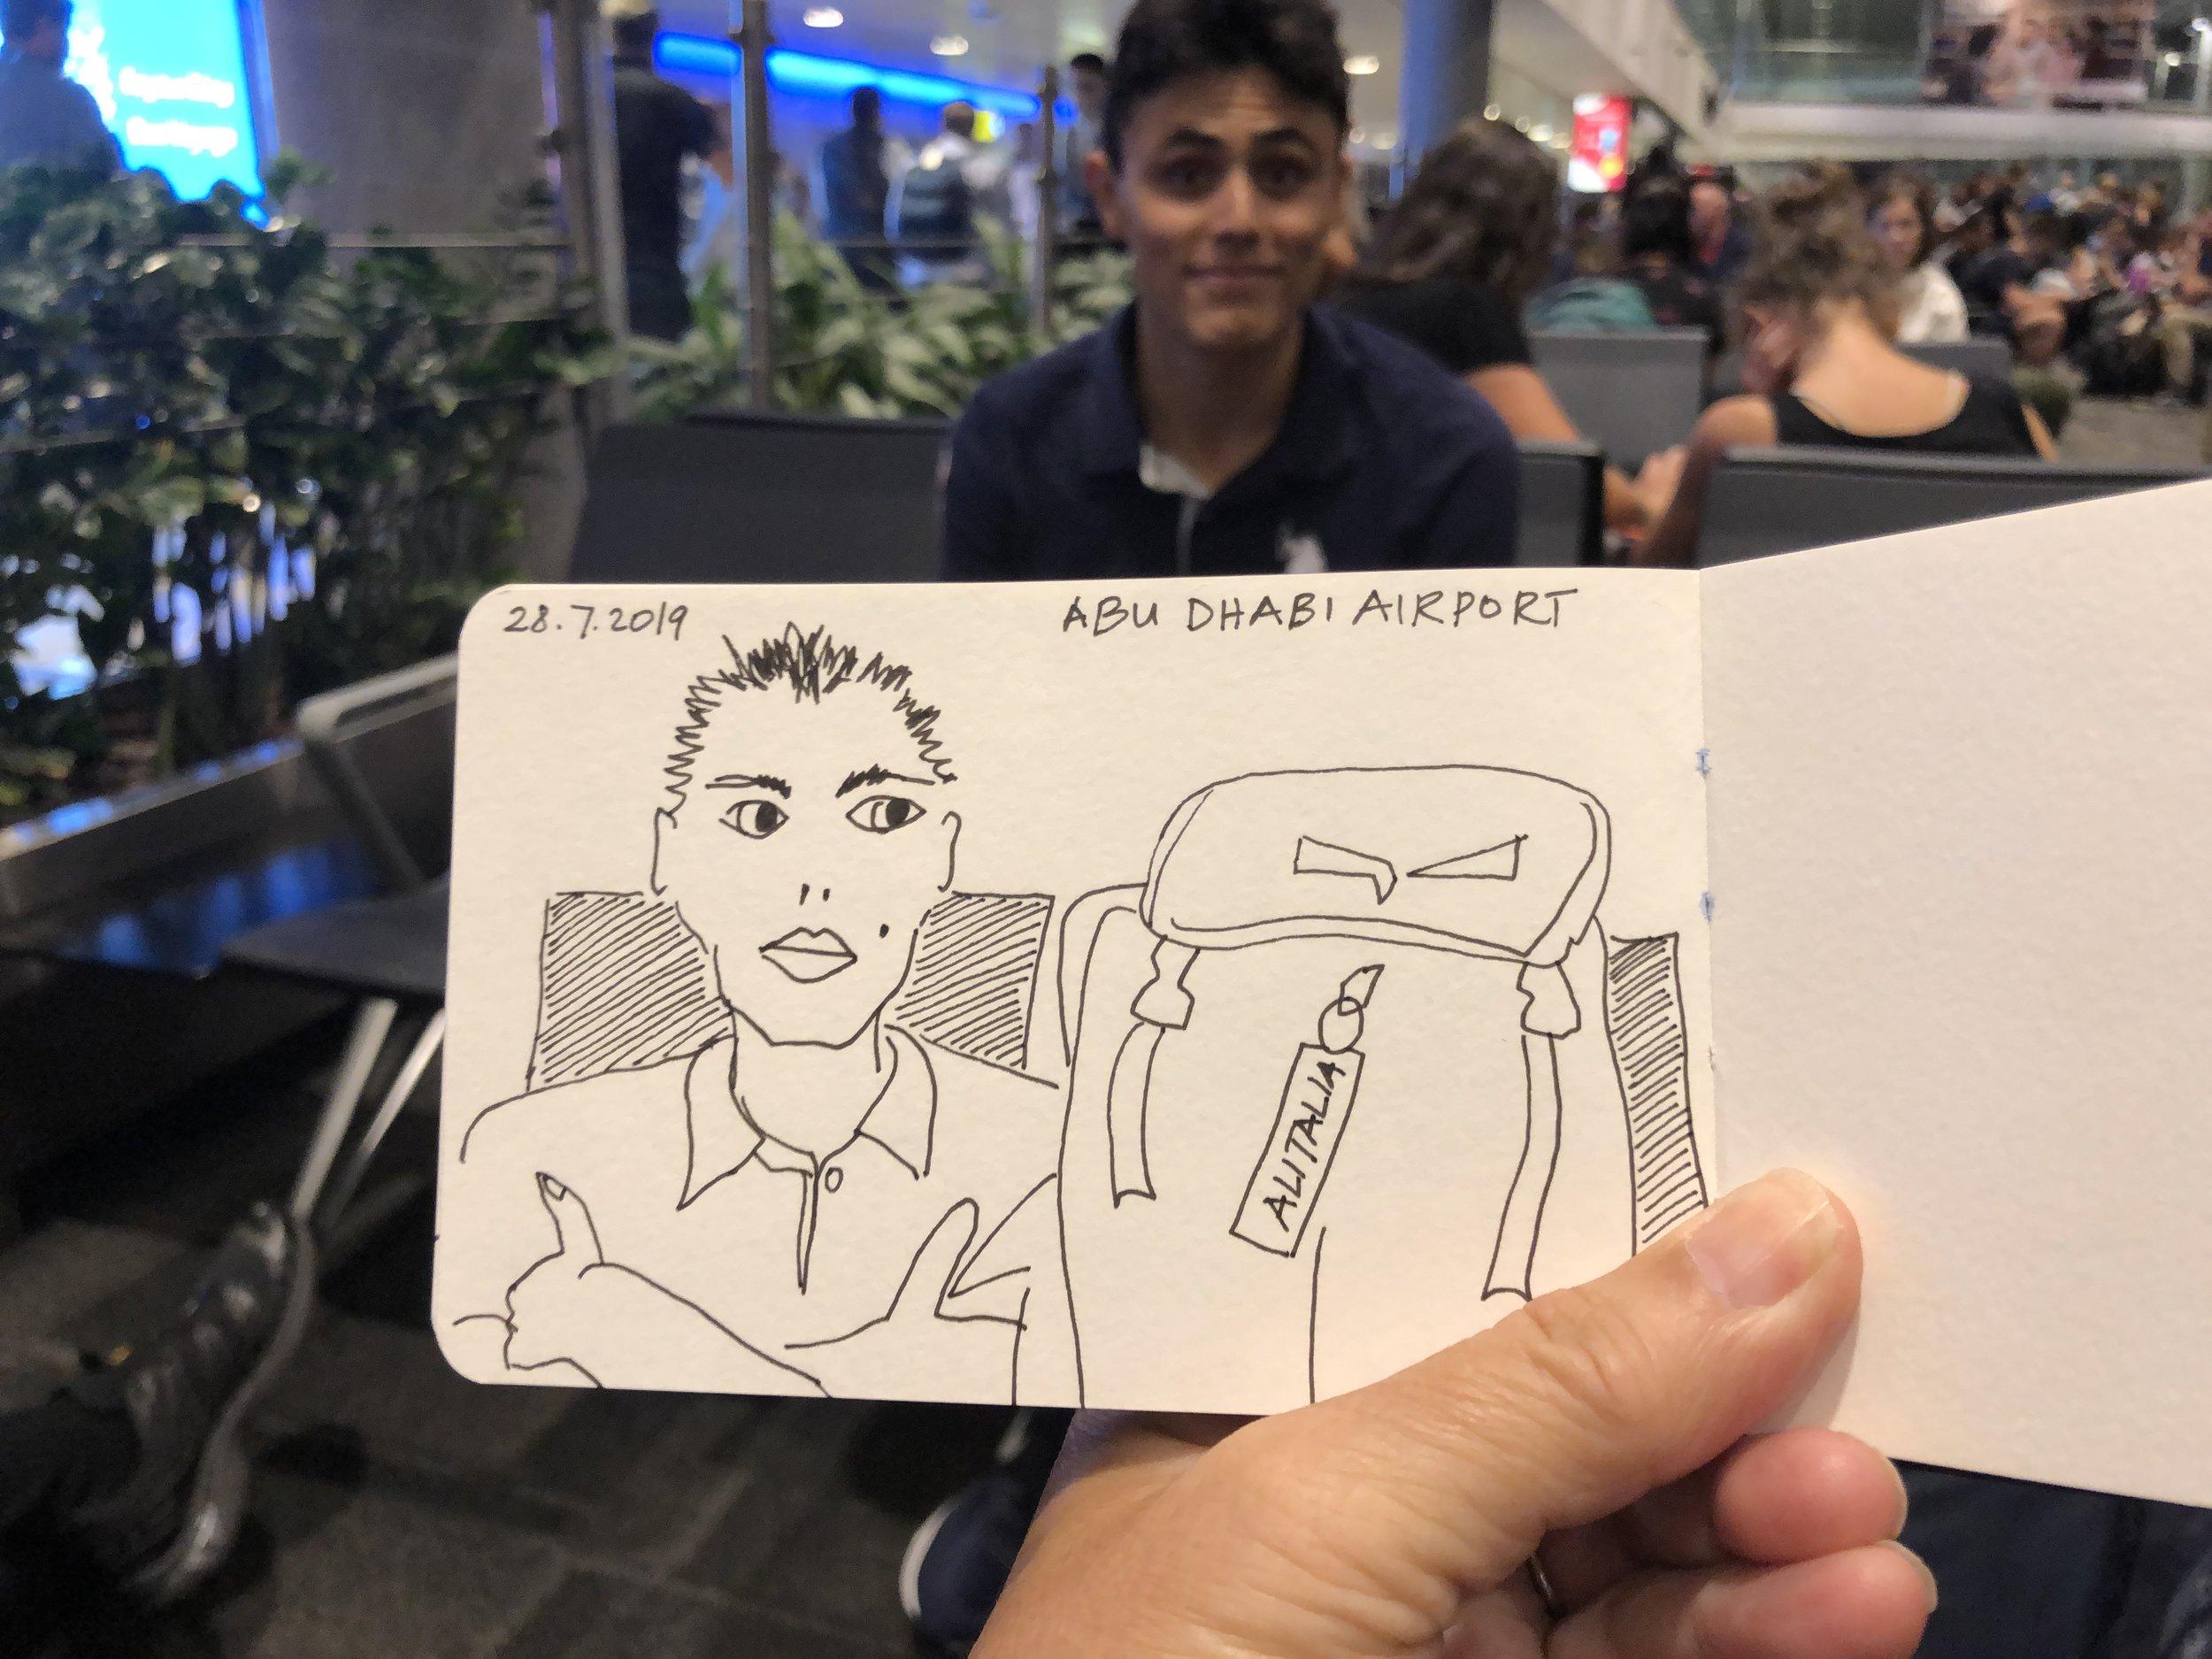 Abu Dhabi International Airport - patron